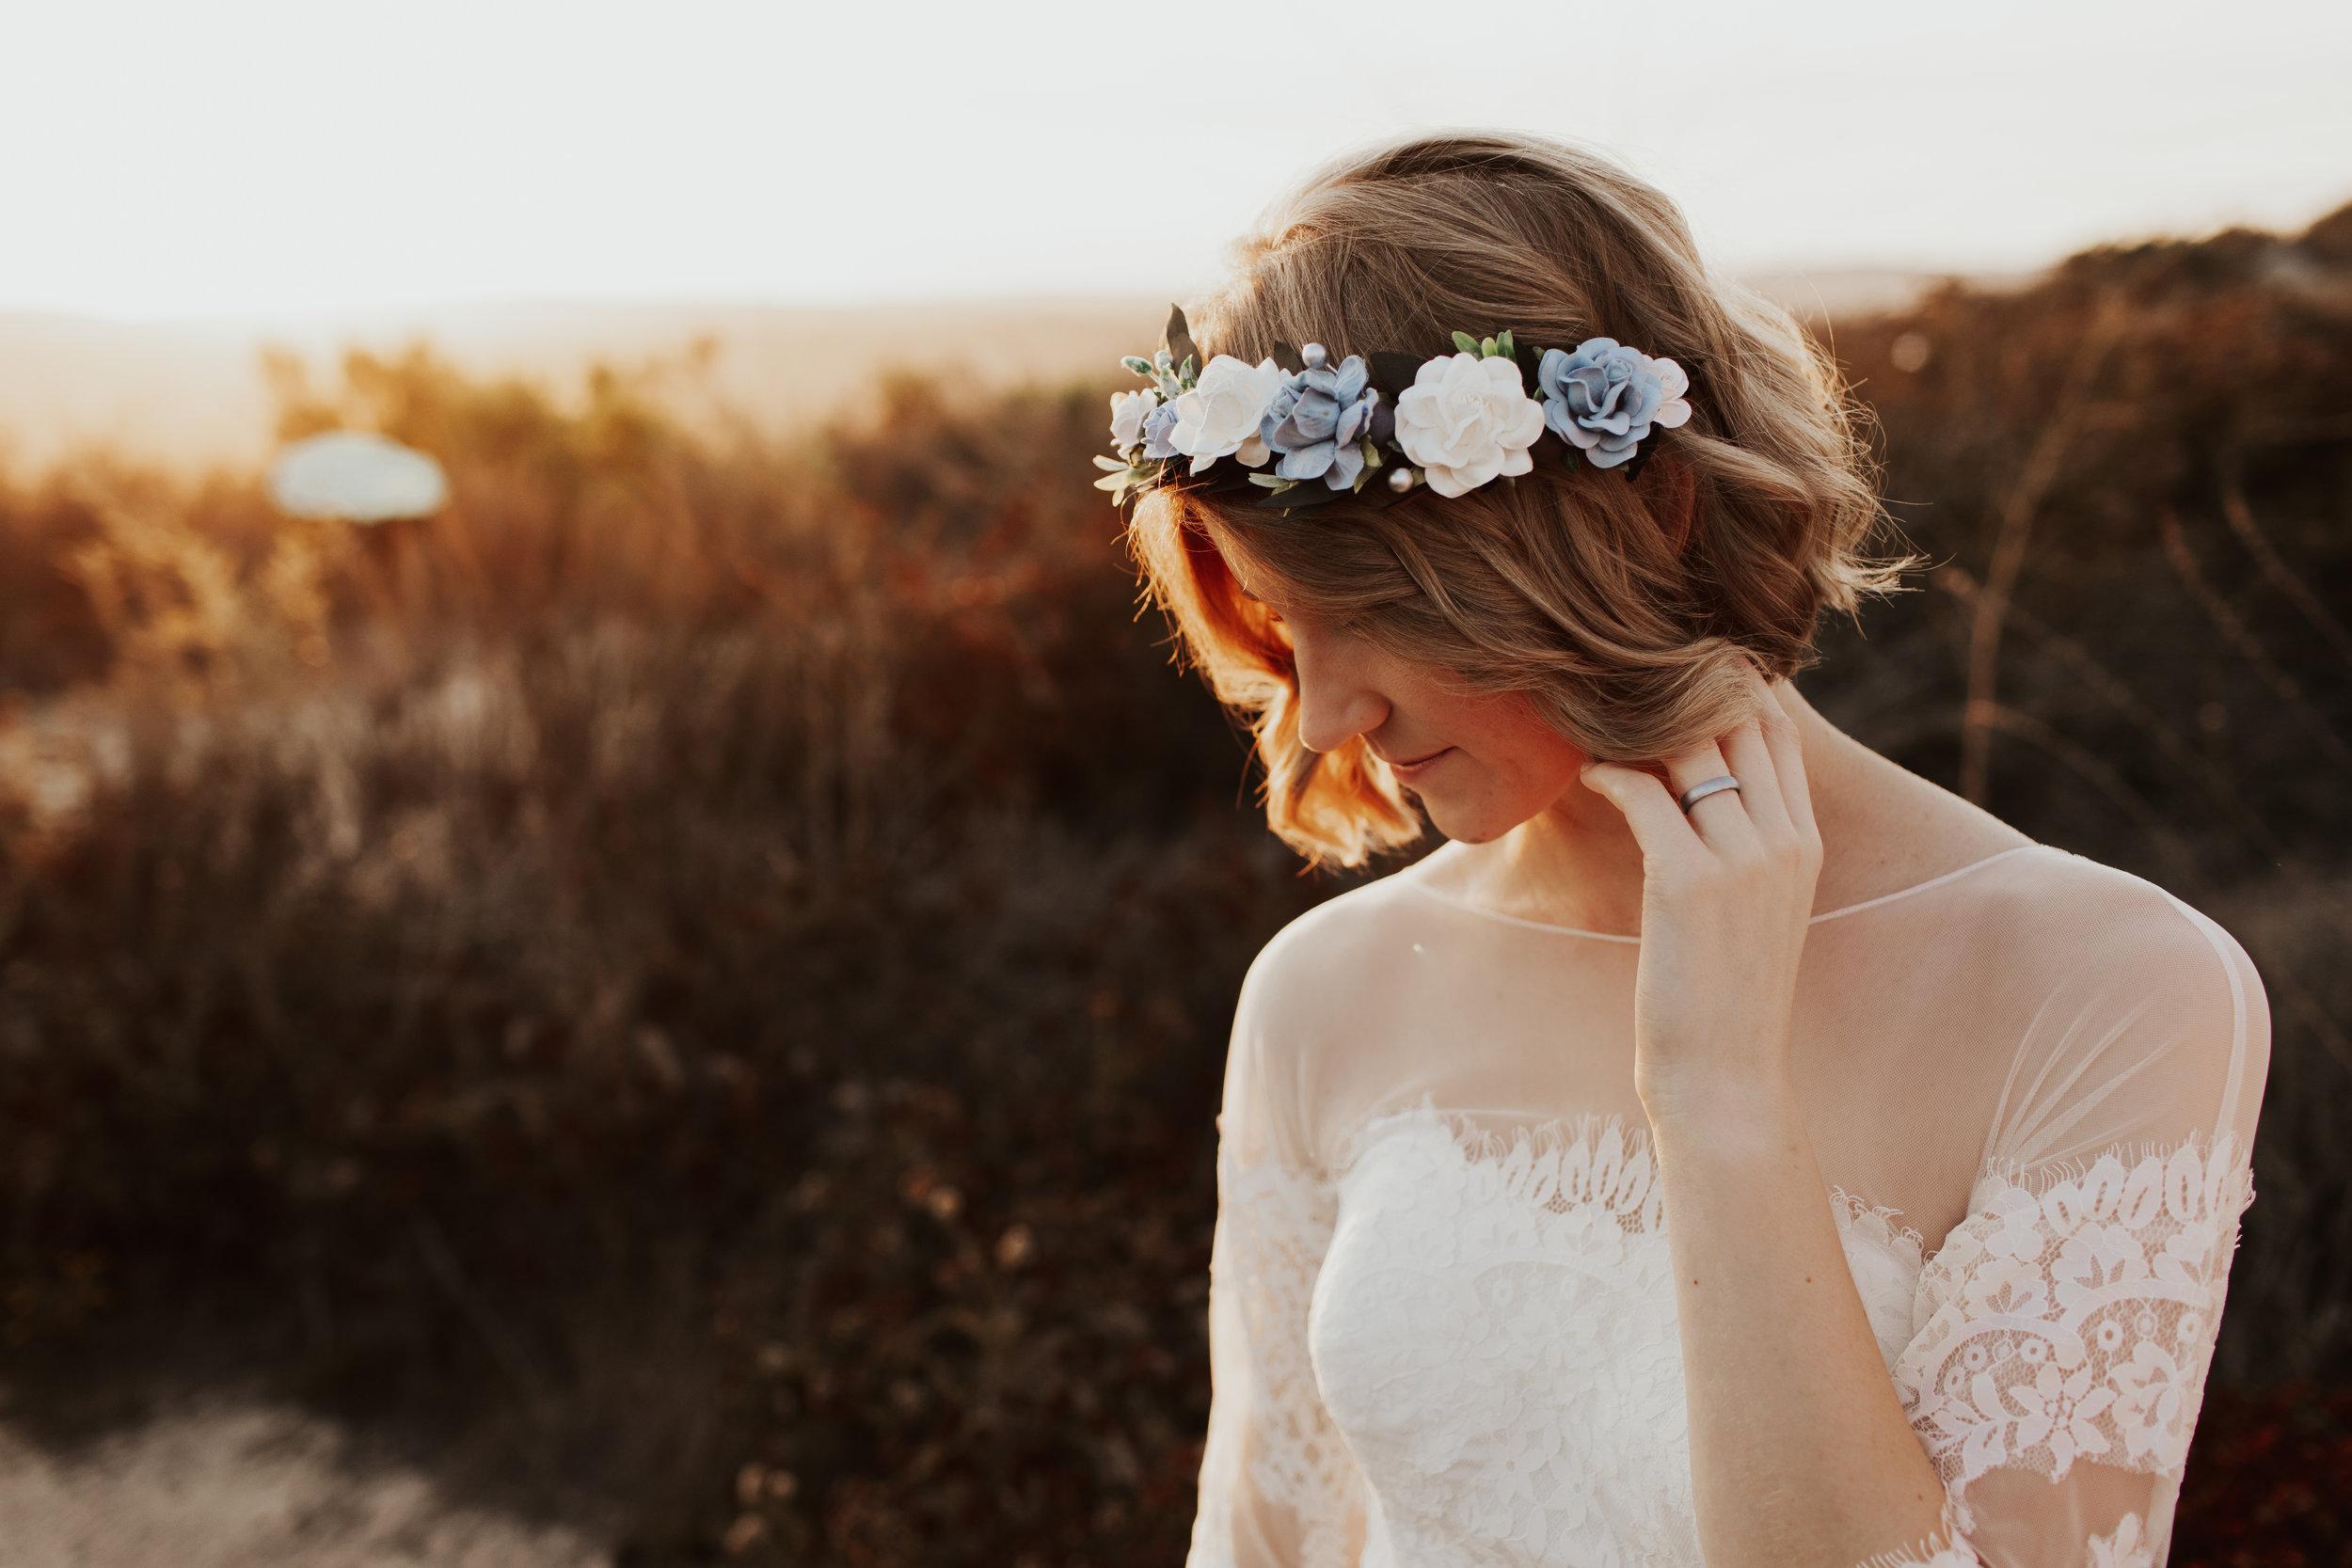 Jessie-Noah-Top-of-the-World-Laguna-Beach-Elopement-Bridal-Wedding-Session-FINISHED-54.jpg